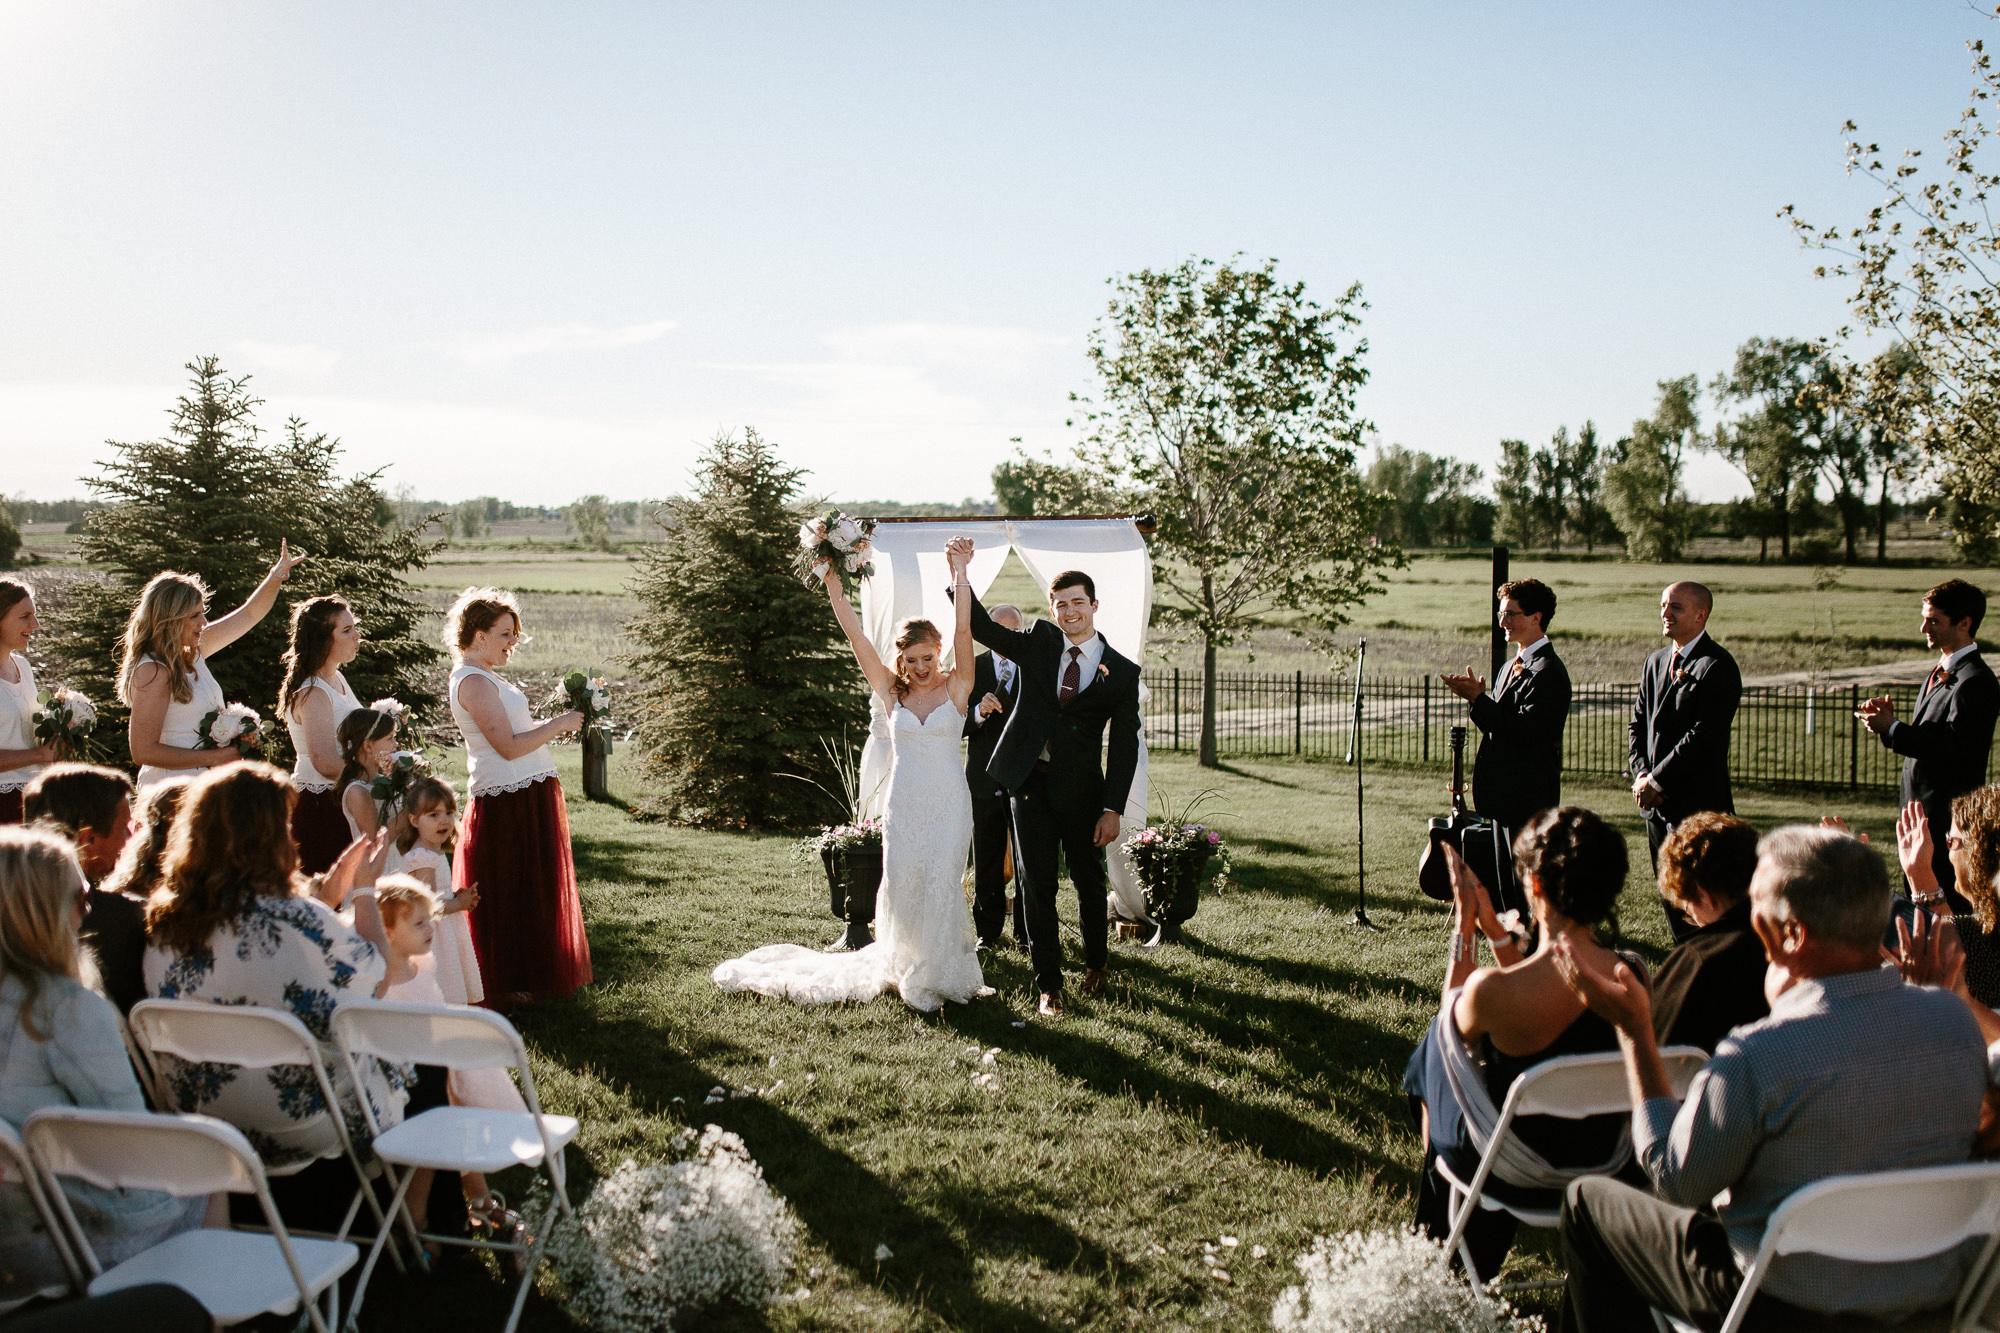 wedding-elopement-adventerous-romantic-timeless-south-dakota-blue-haven-barn-056.jpg